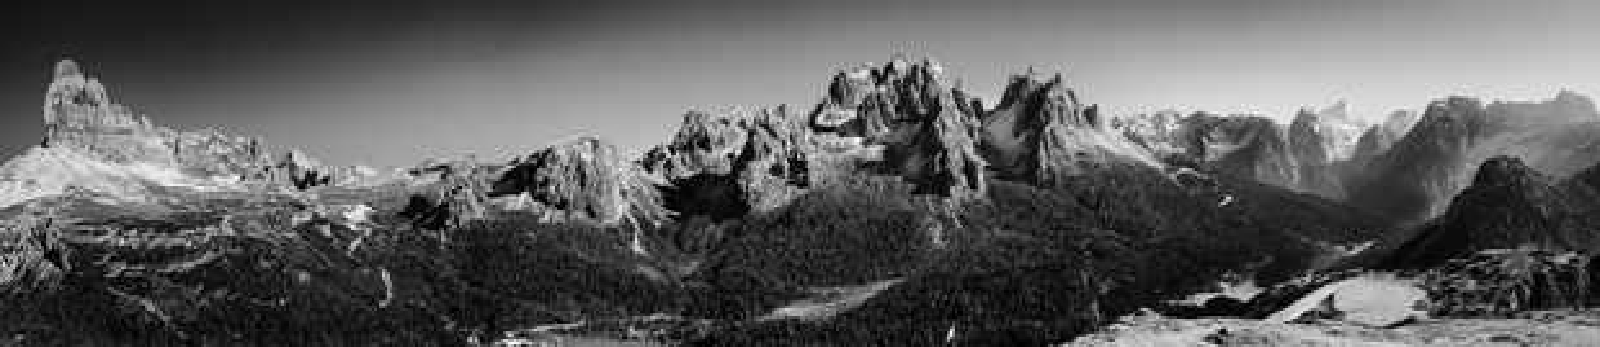 Dolomiten - Rudolf Rother